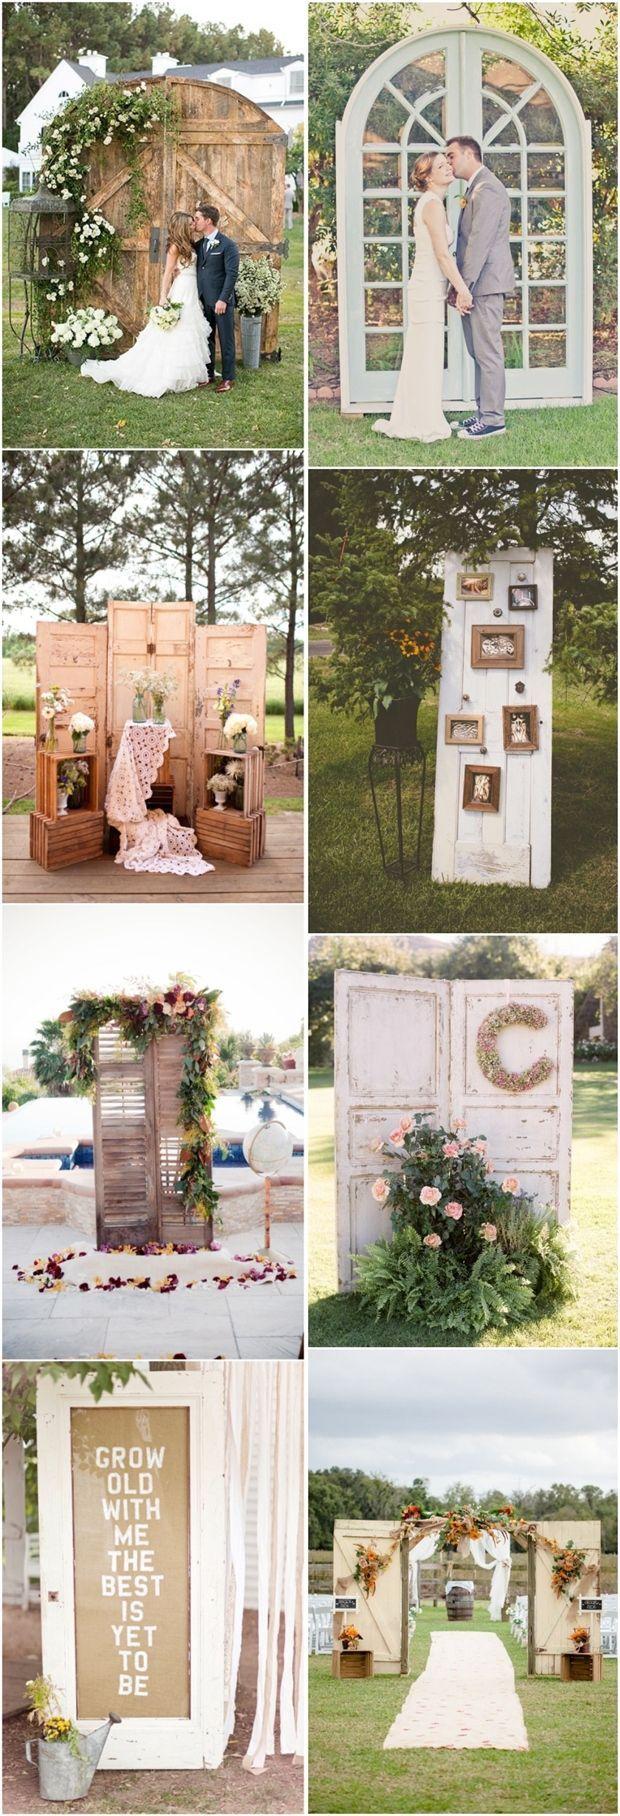 35 Rustic Old Door Wedding Decor Ideas for Outdoor Country Weddings | http://www.deerpearlflowers.com/rustic-old-door-wedding-decor-ideas-for-outdoor-country-weddings/